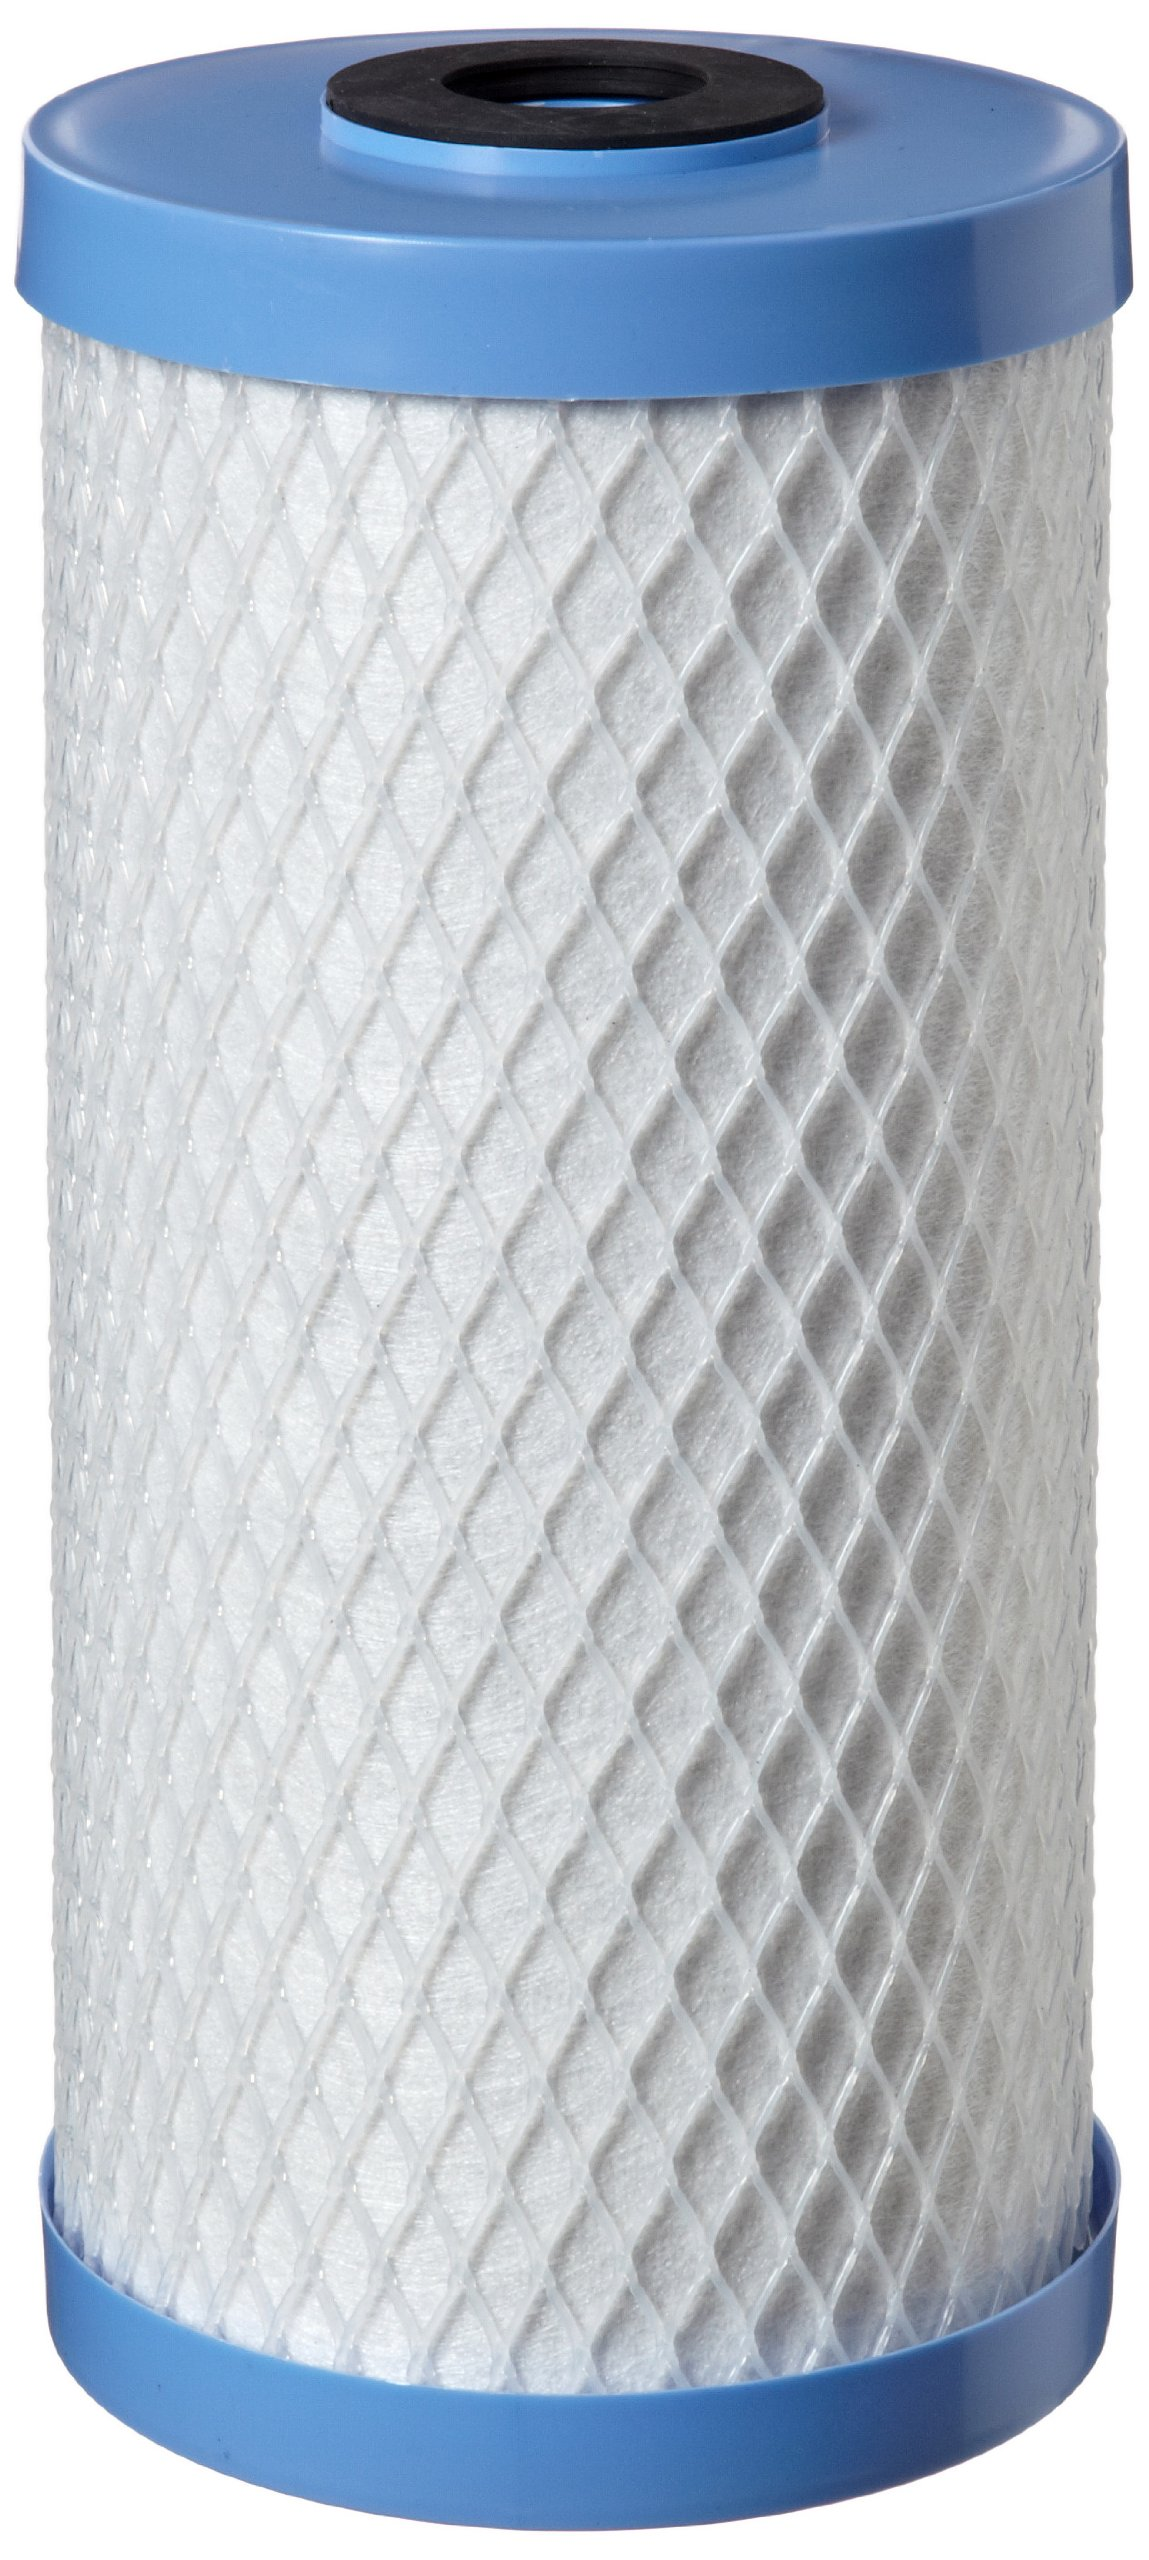 4 Pack Fits Pentek CB1-10 Compatible 1 Micron Standard 10 Carbon Water Filter 255382-43